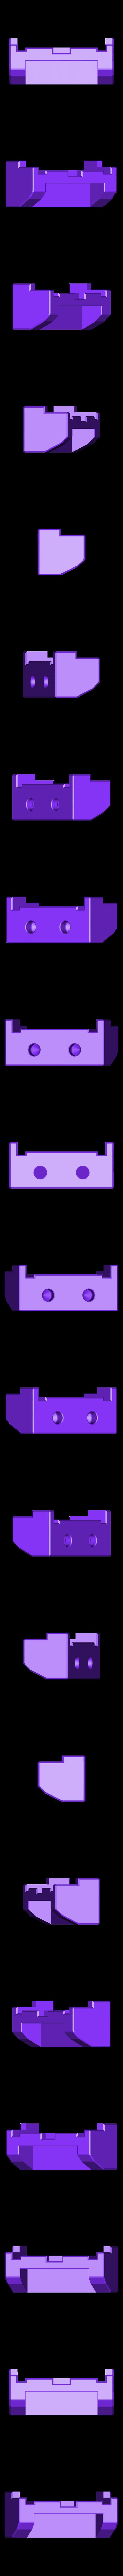 SmallToys-EndBumper.stl Download STL file SmallToys - Railways - Bumper stop • 3D printable model, Wabby